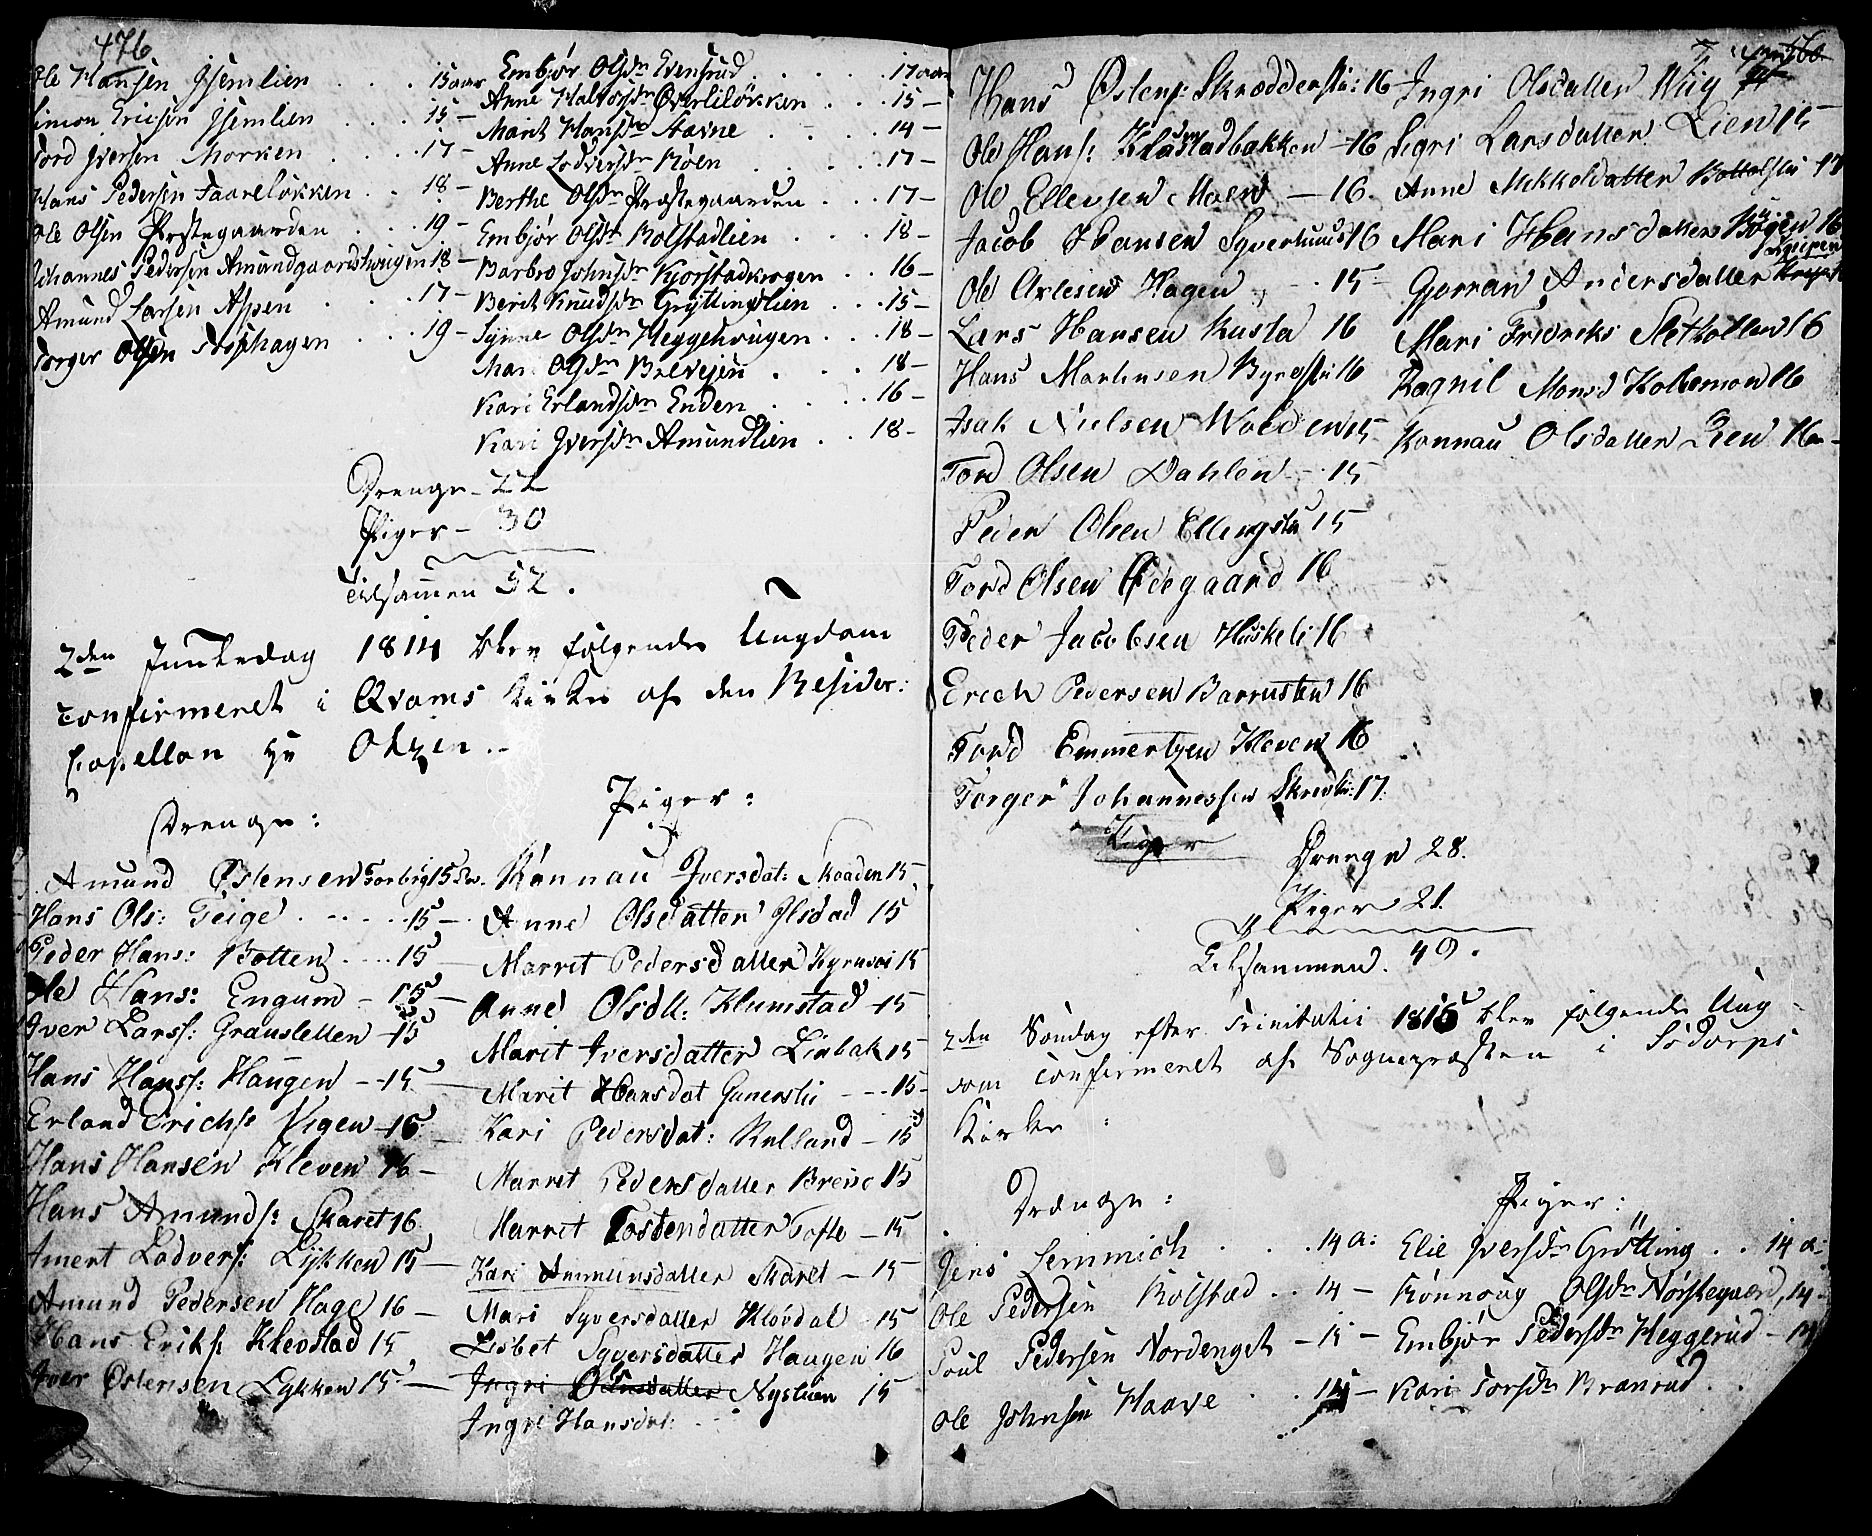 SAH, Fron prestekontor, H/Ha/Haa/L0001: Ministerialbok nr. 1, 1799-1816, s. 476-477